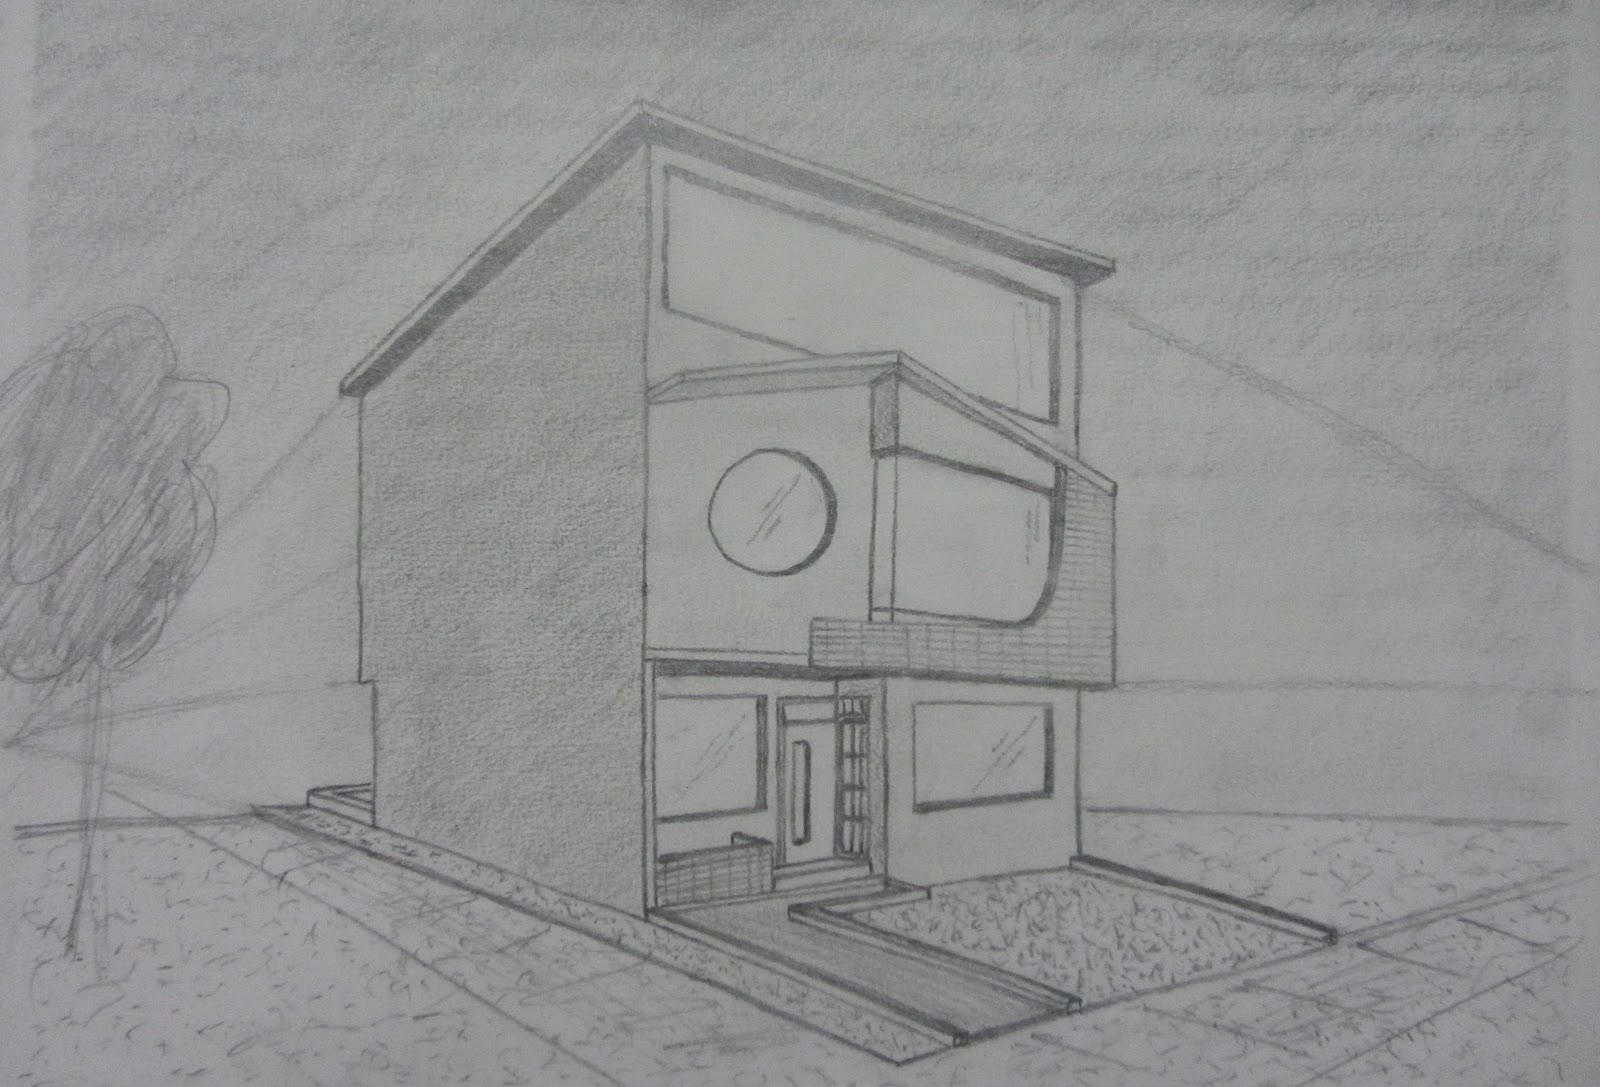 El arte del dibujar - Casas dibujadas a lapiz ...